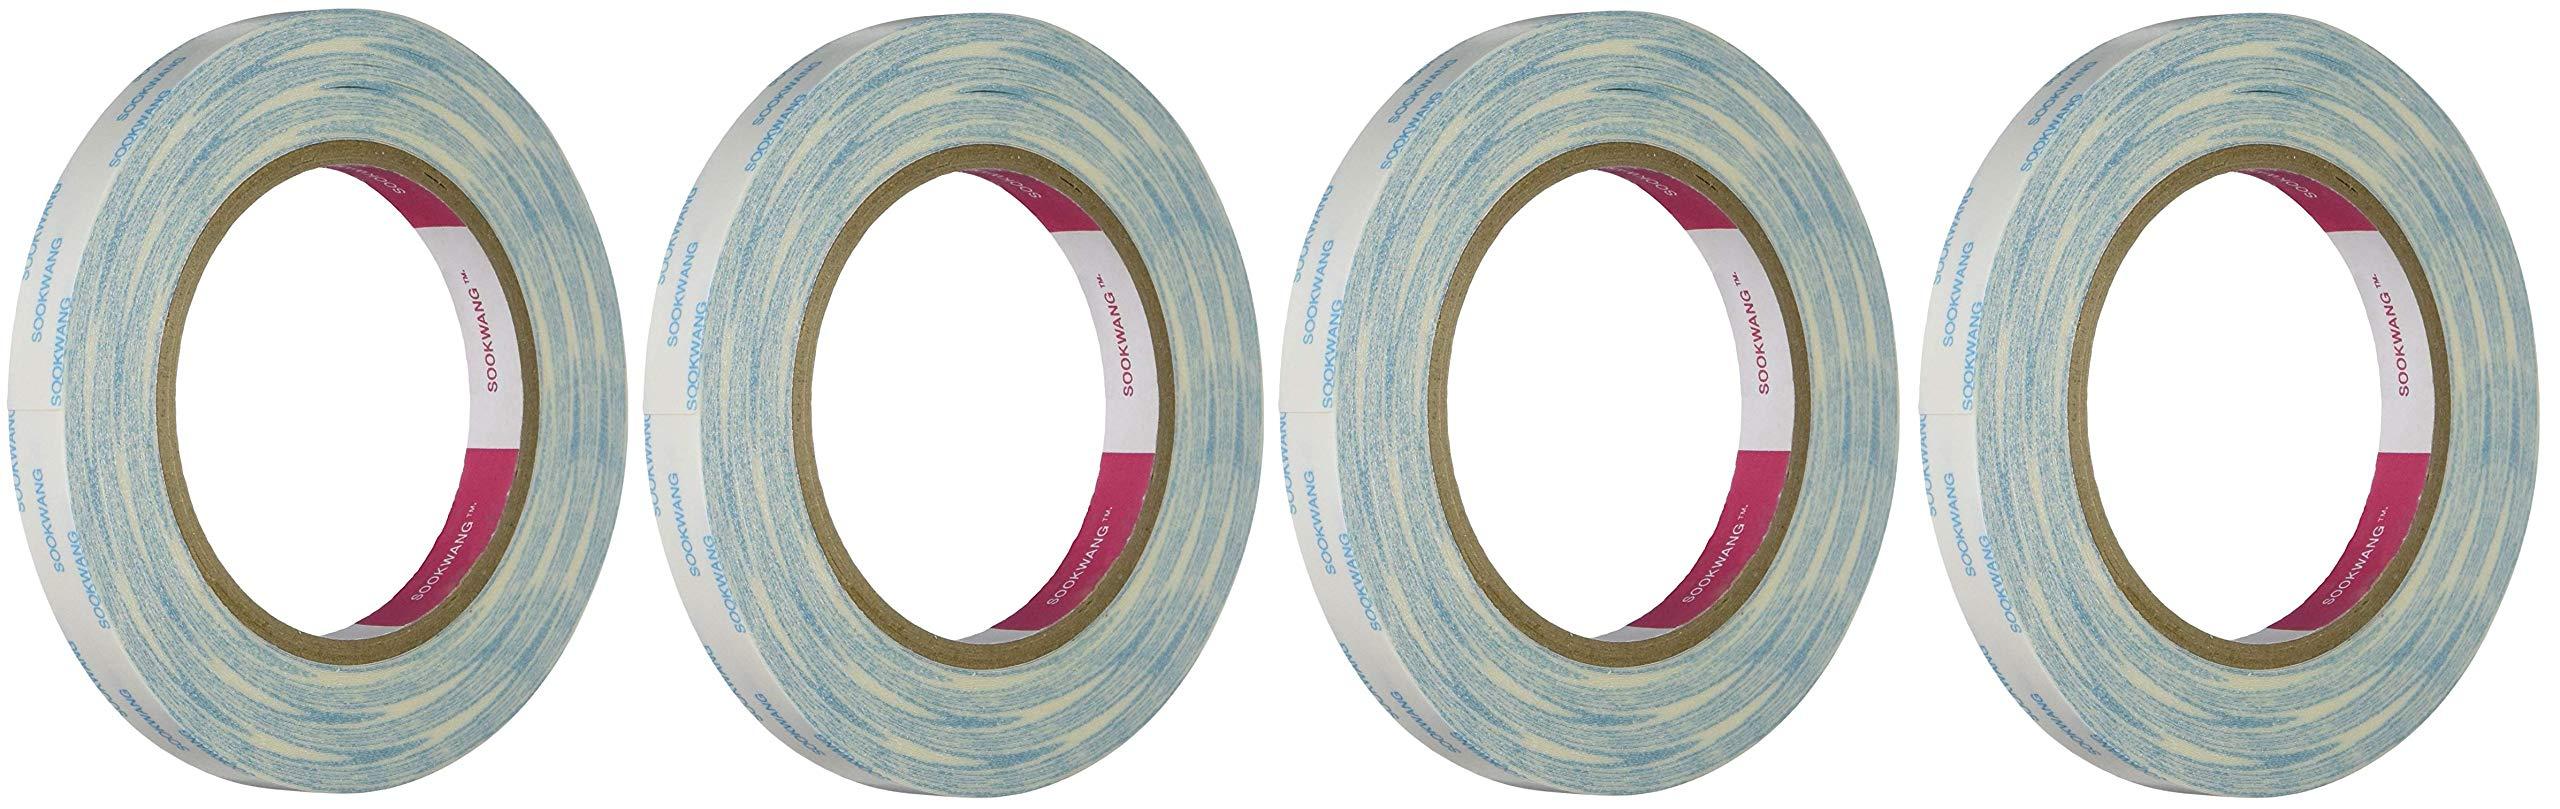 Scor-Pal SP203 Scor-Tape 1/2'' X 27yds- (Fоur Расk)